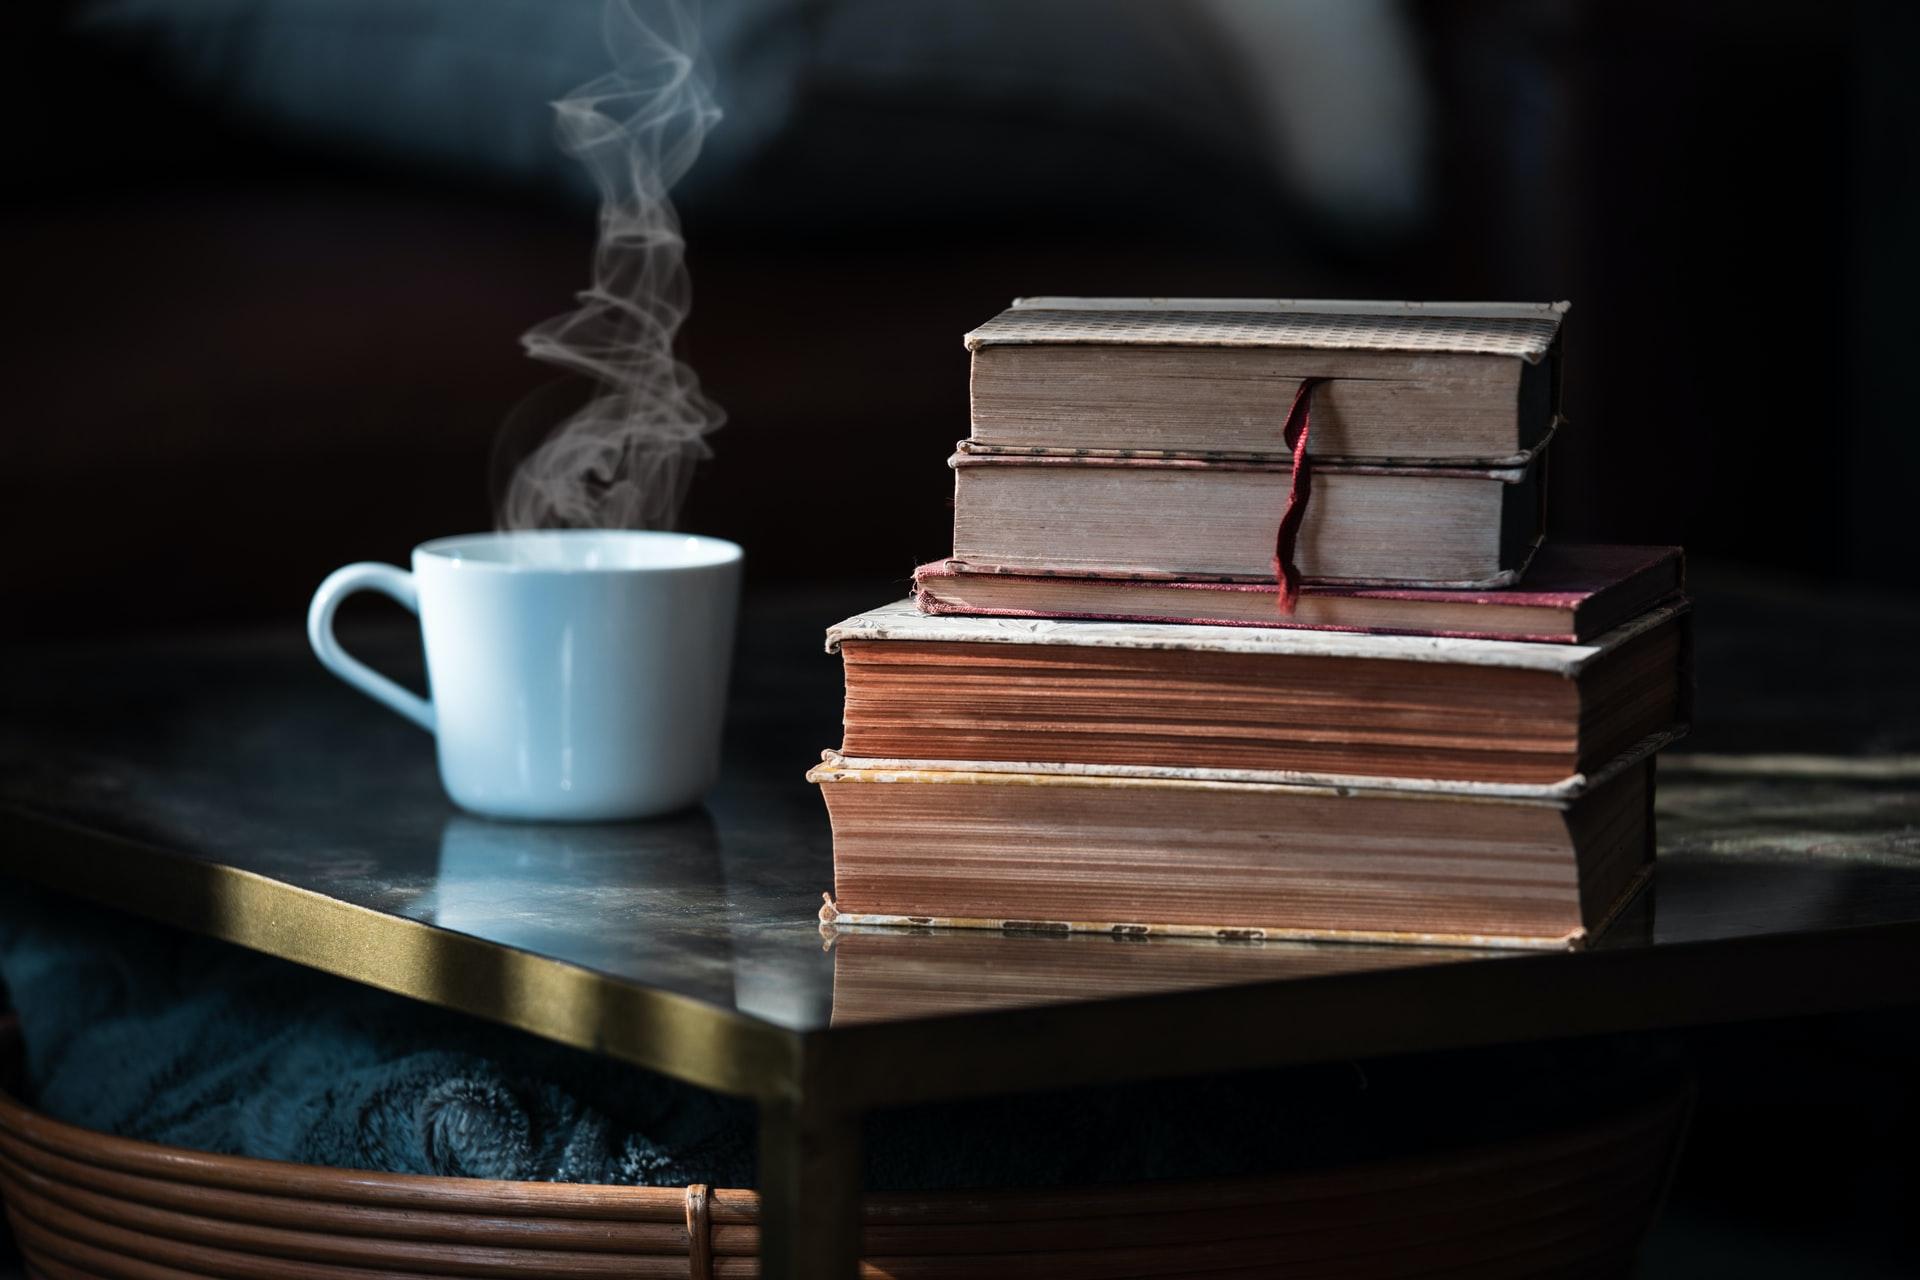 8 Inspiring Books like When Breath Becomes Air